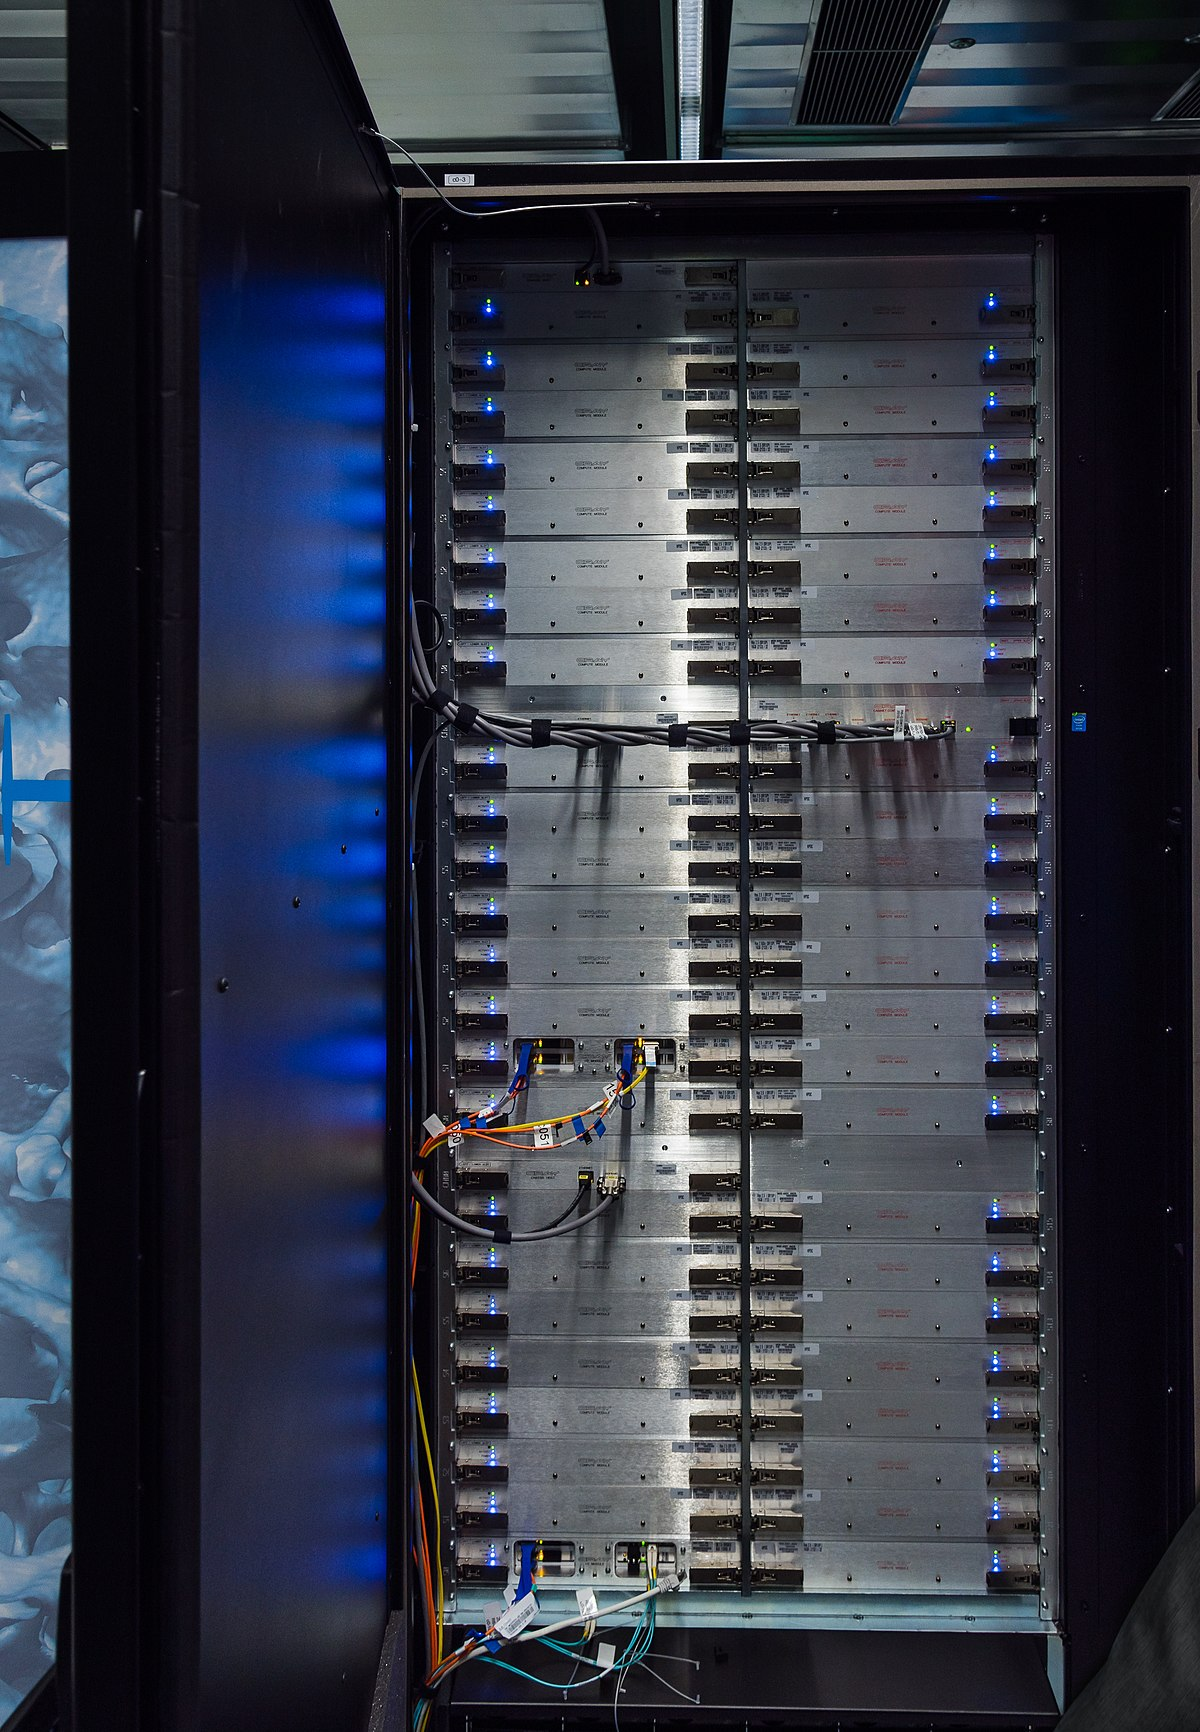 Cray Xc40 Wikipedia